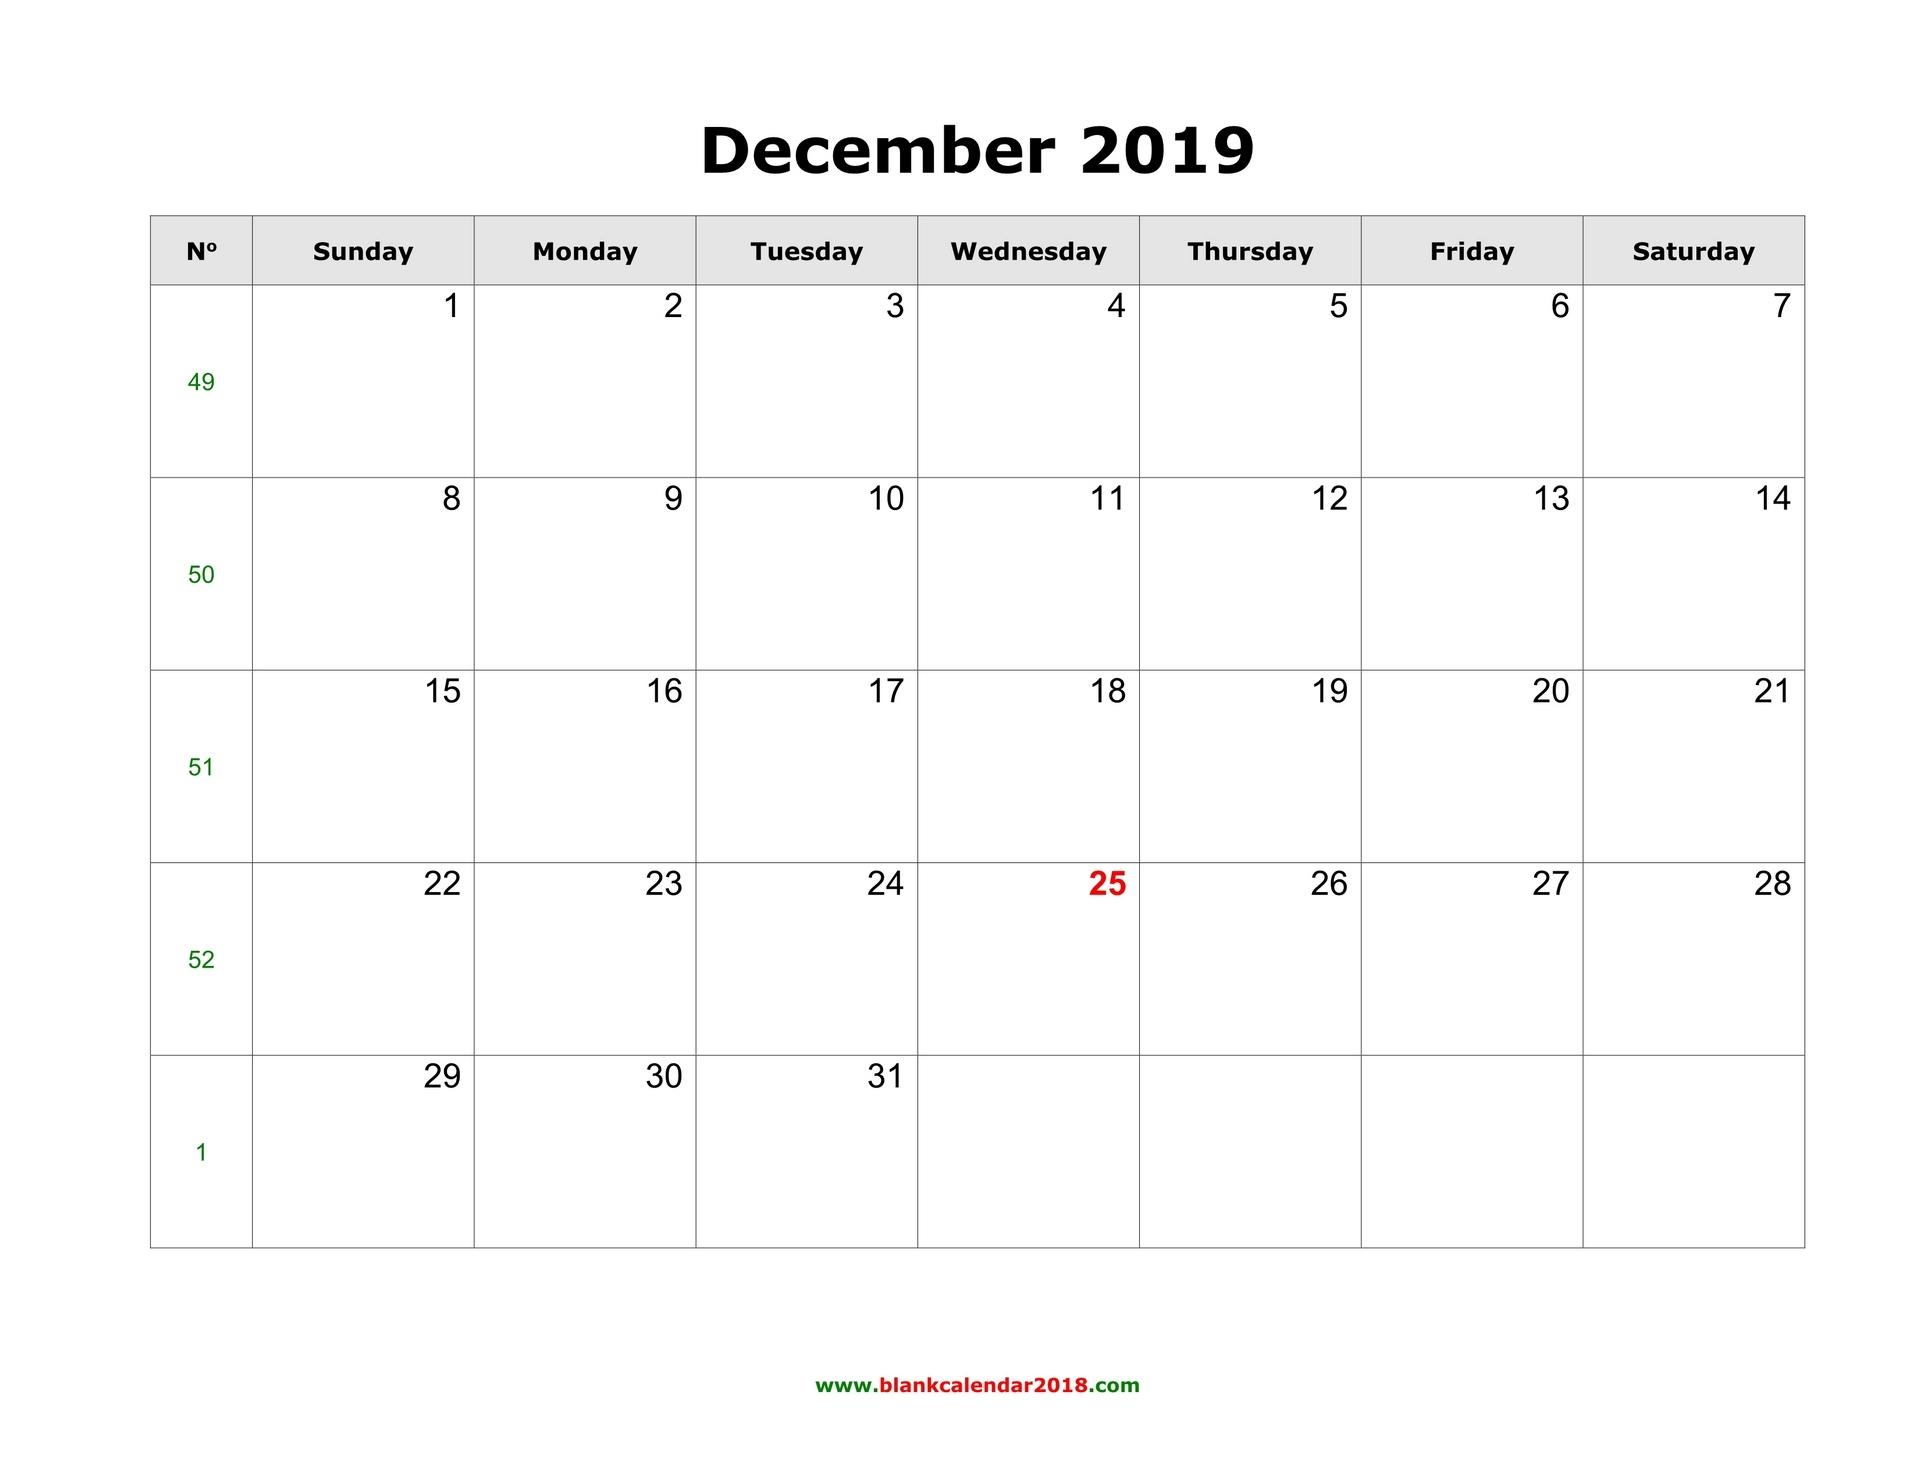 December 2019 Calendar Printable Pdf